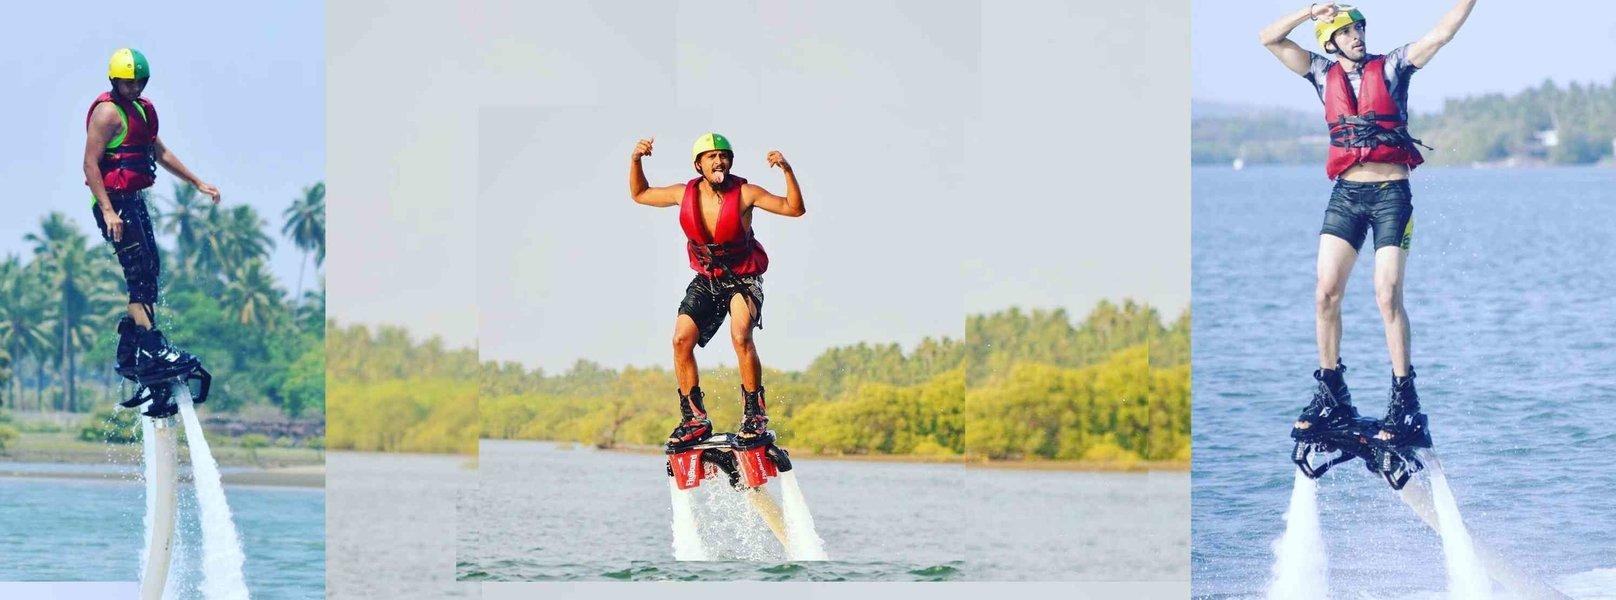 Flyboarding in Goa - Tour